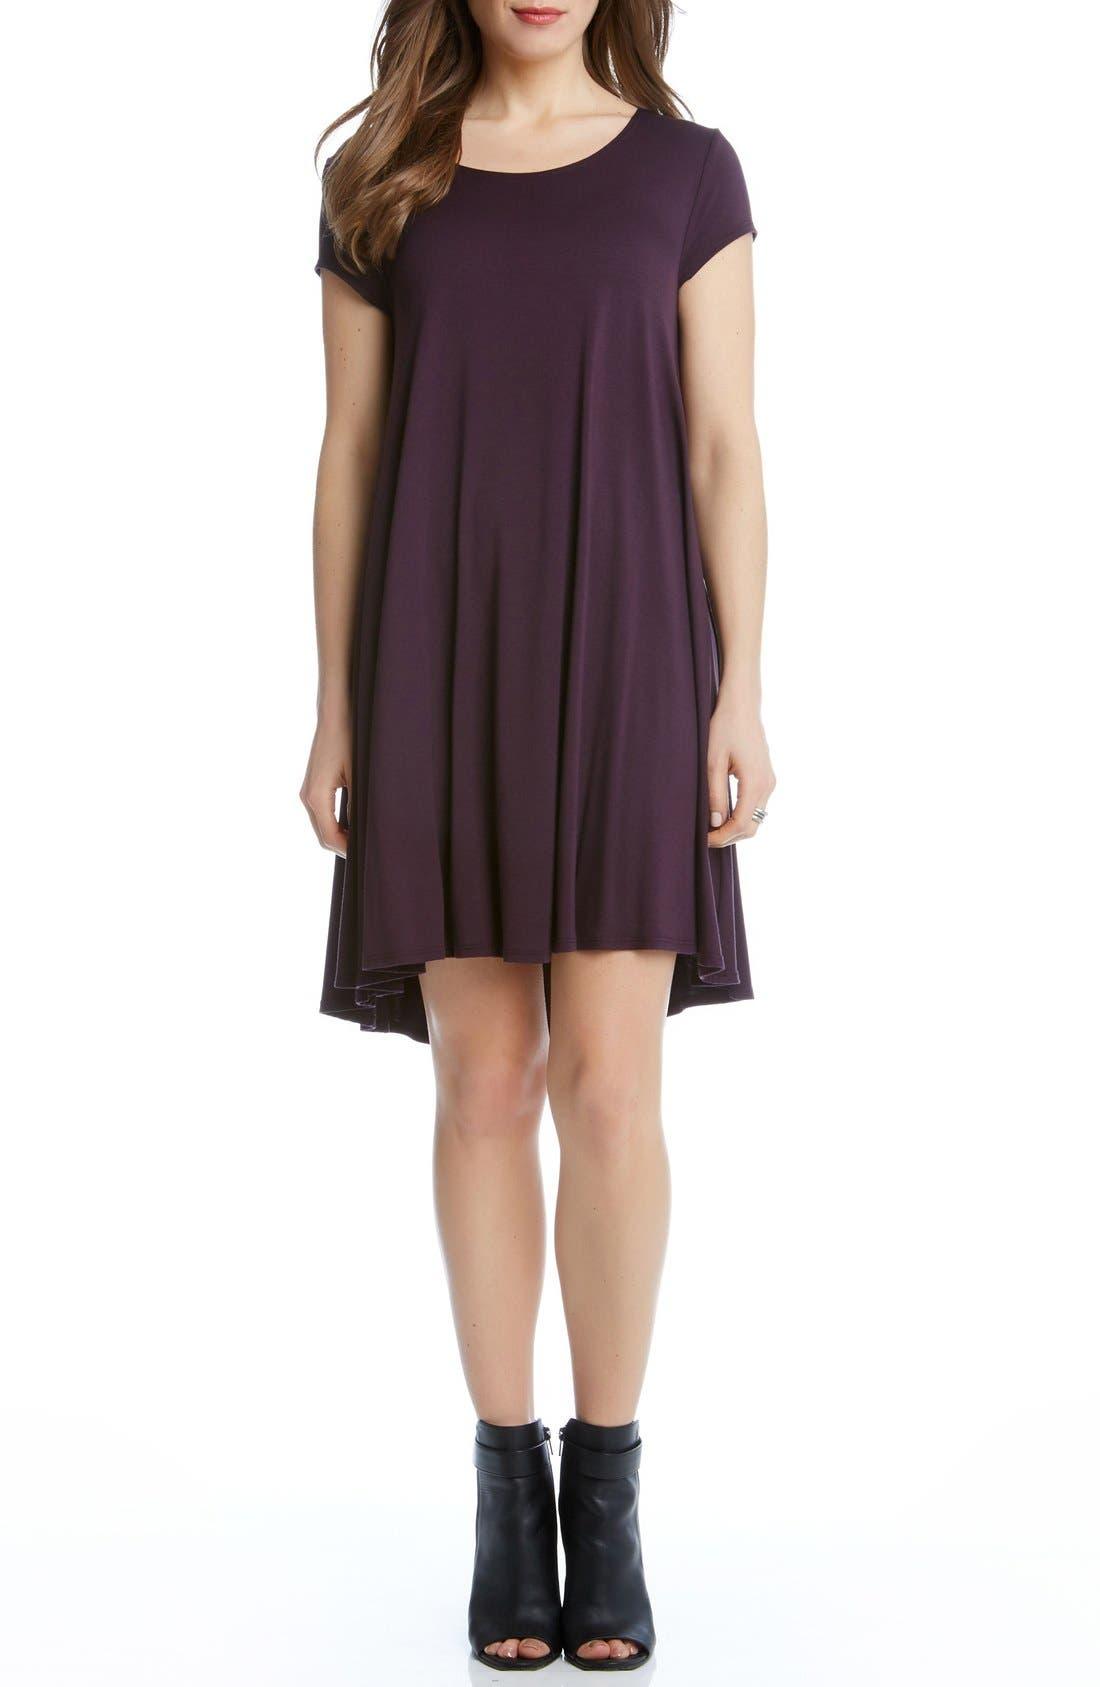 Alternate Image 1 Selected - Karen Kane 'Maggie' Cap Sleeve Trapeze Dress